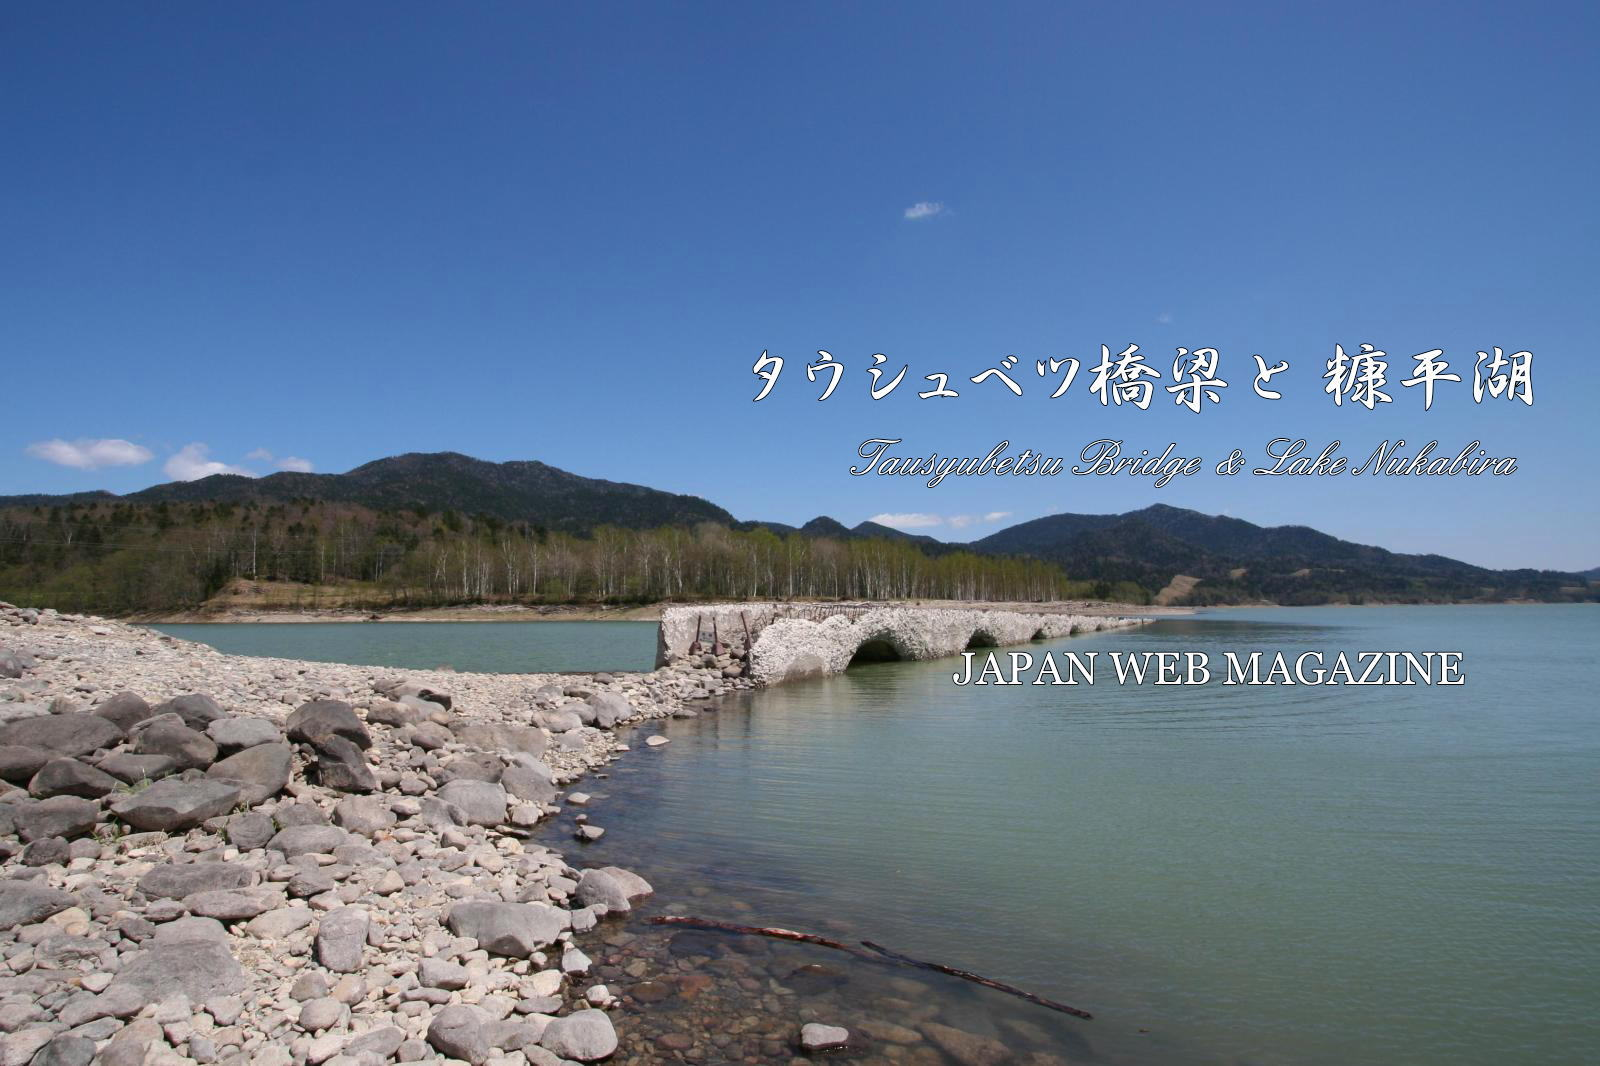 Tausyubetu bridge and Lake Nukabira